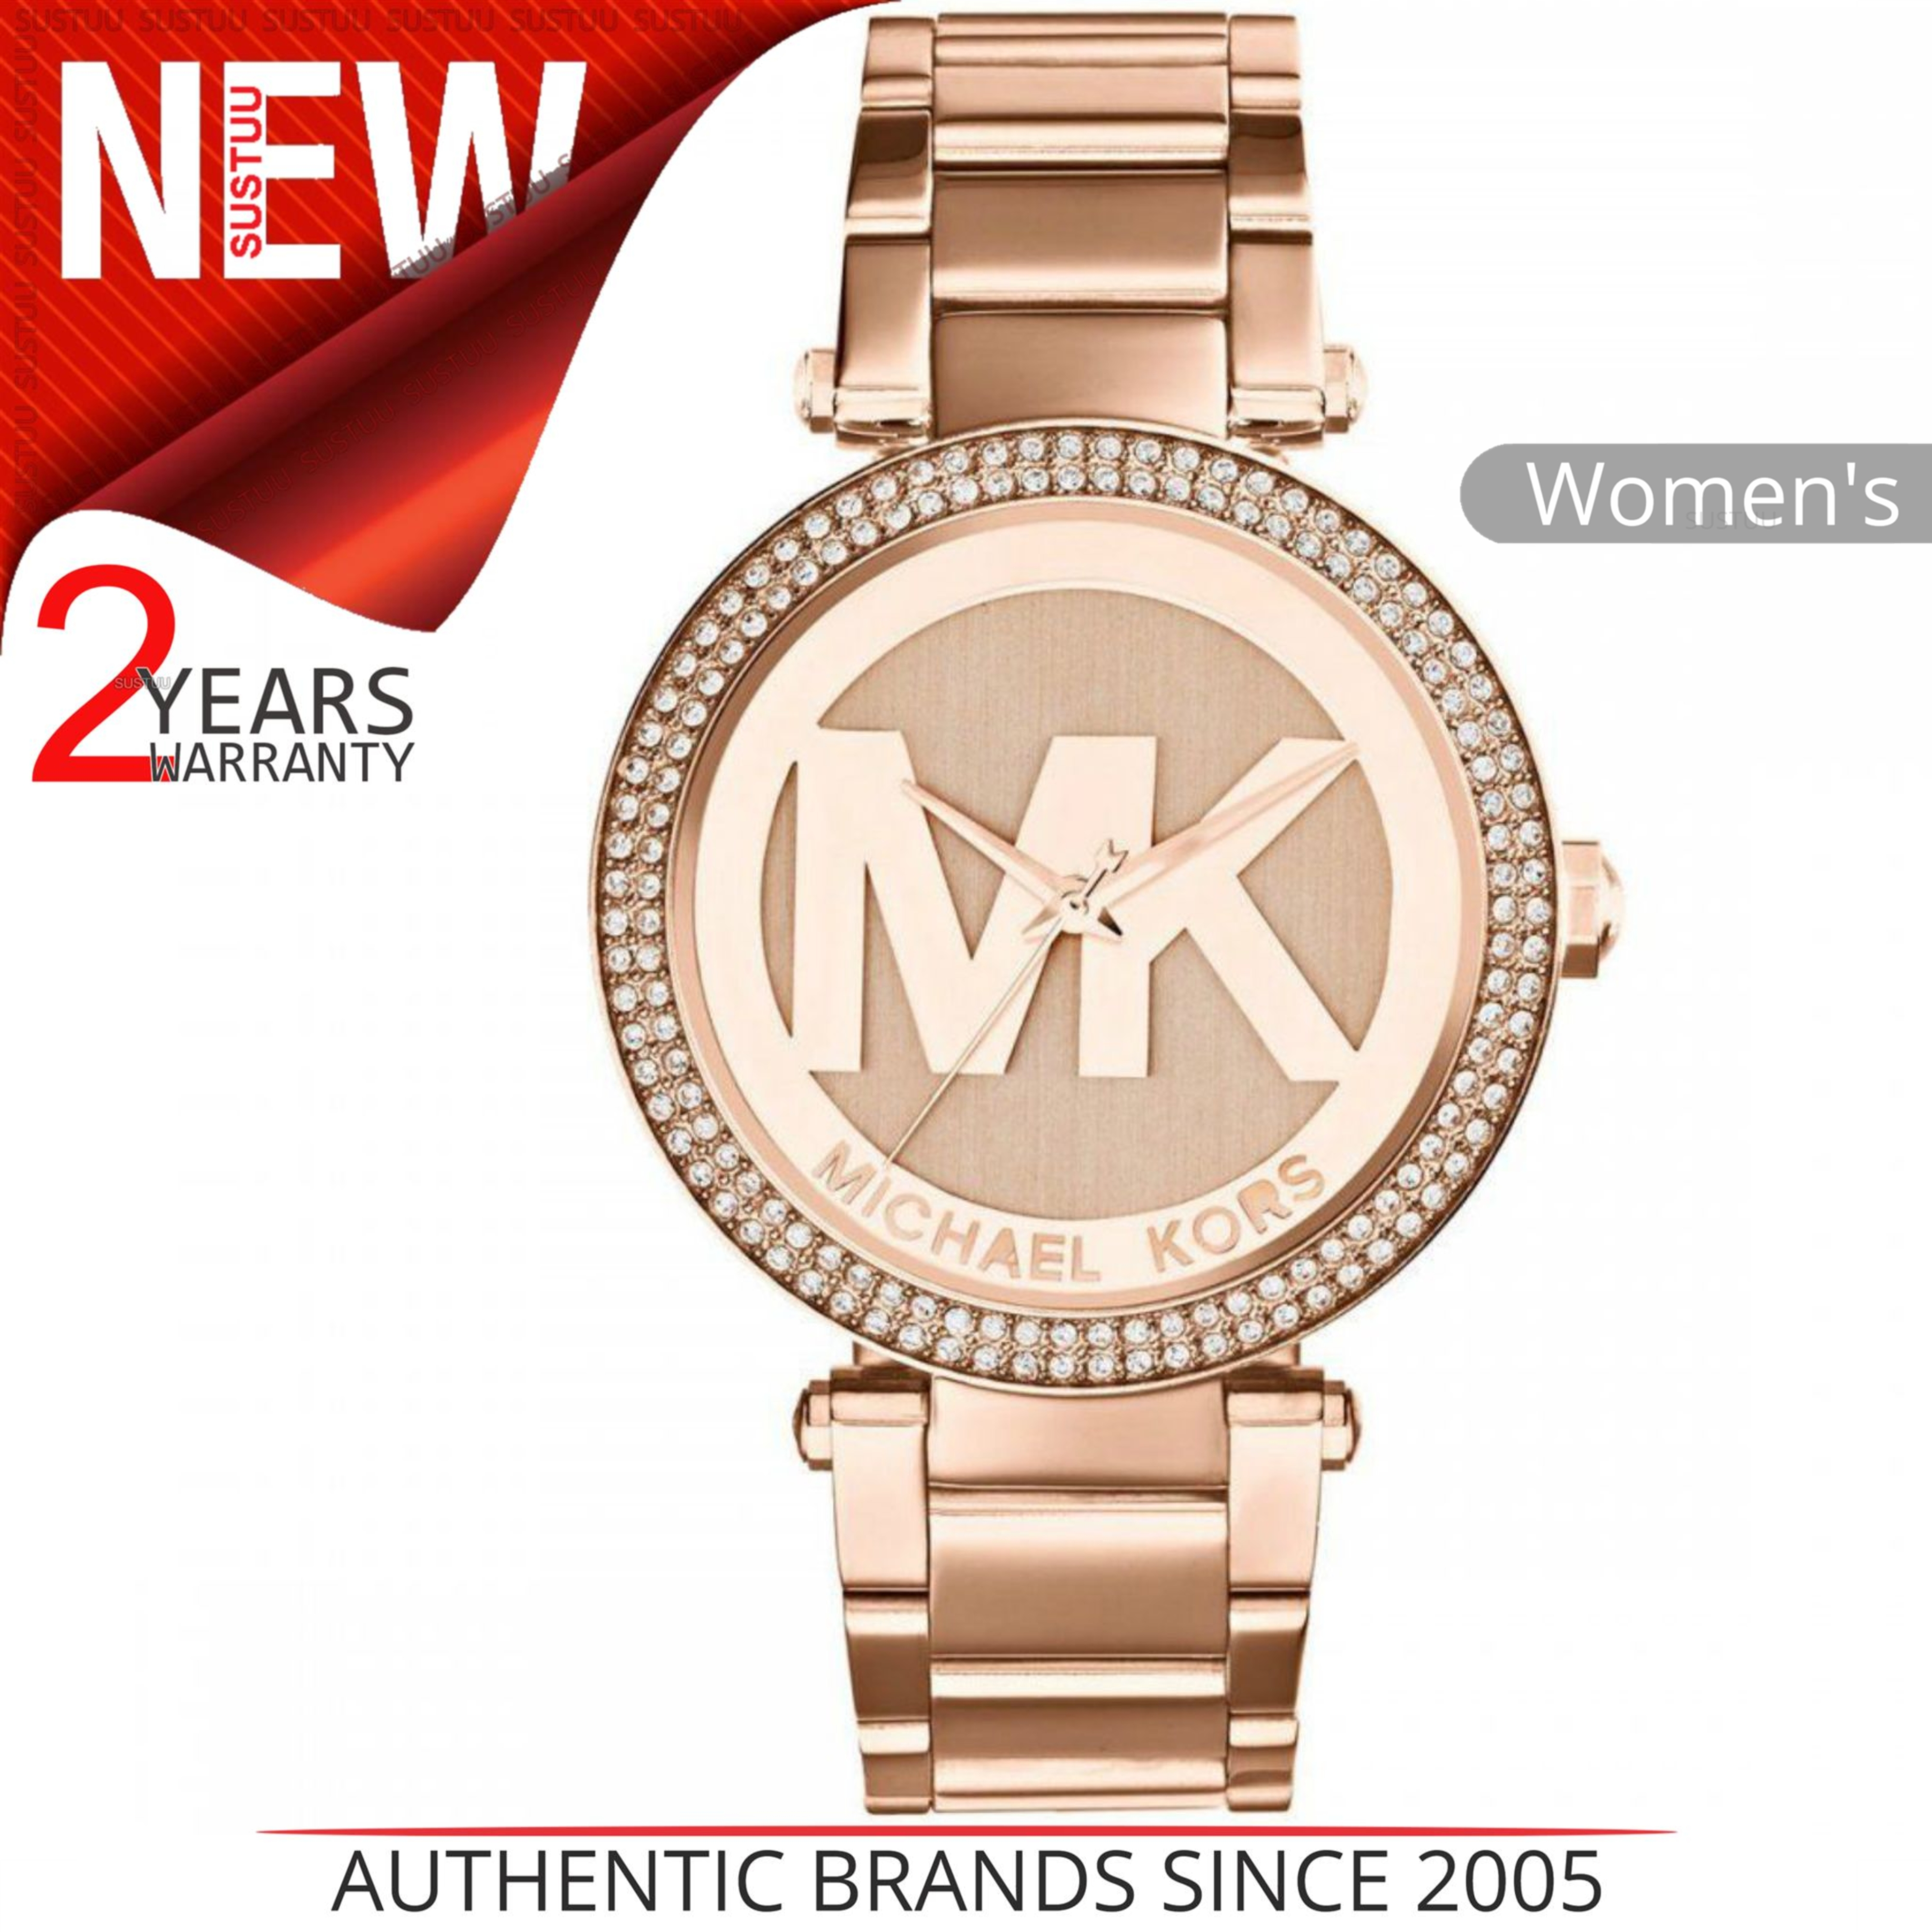 e38ee718477e Details about Michael Kors Parker Women s Watch MK5865│Rose Gold MK Logo  Dial│Bracelet Band